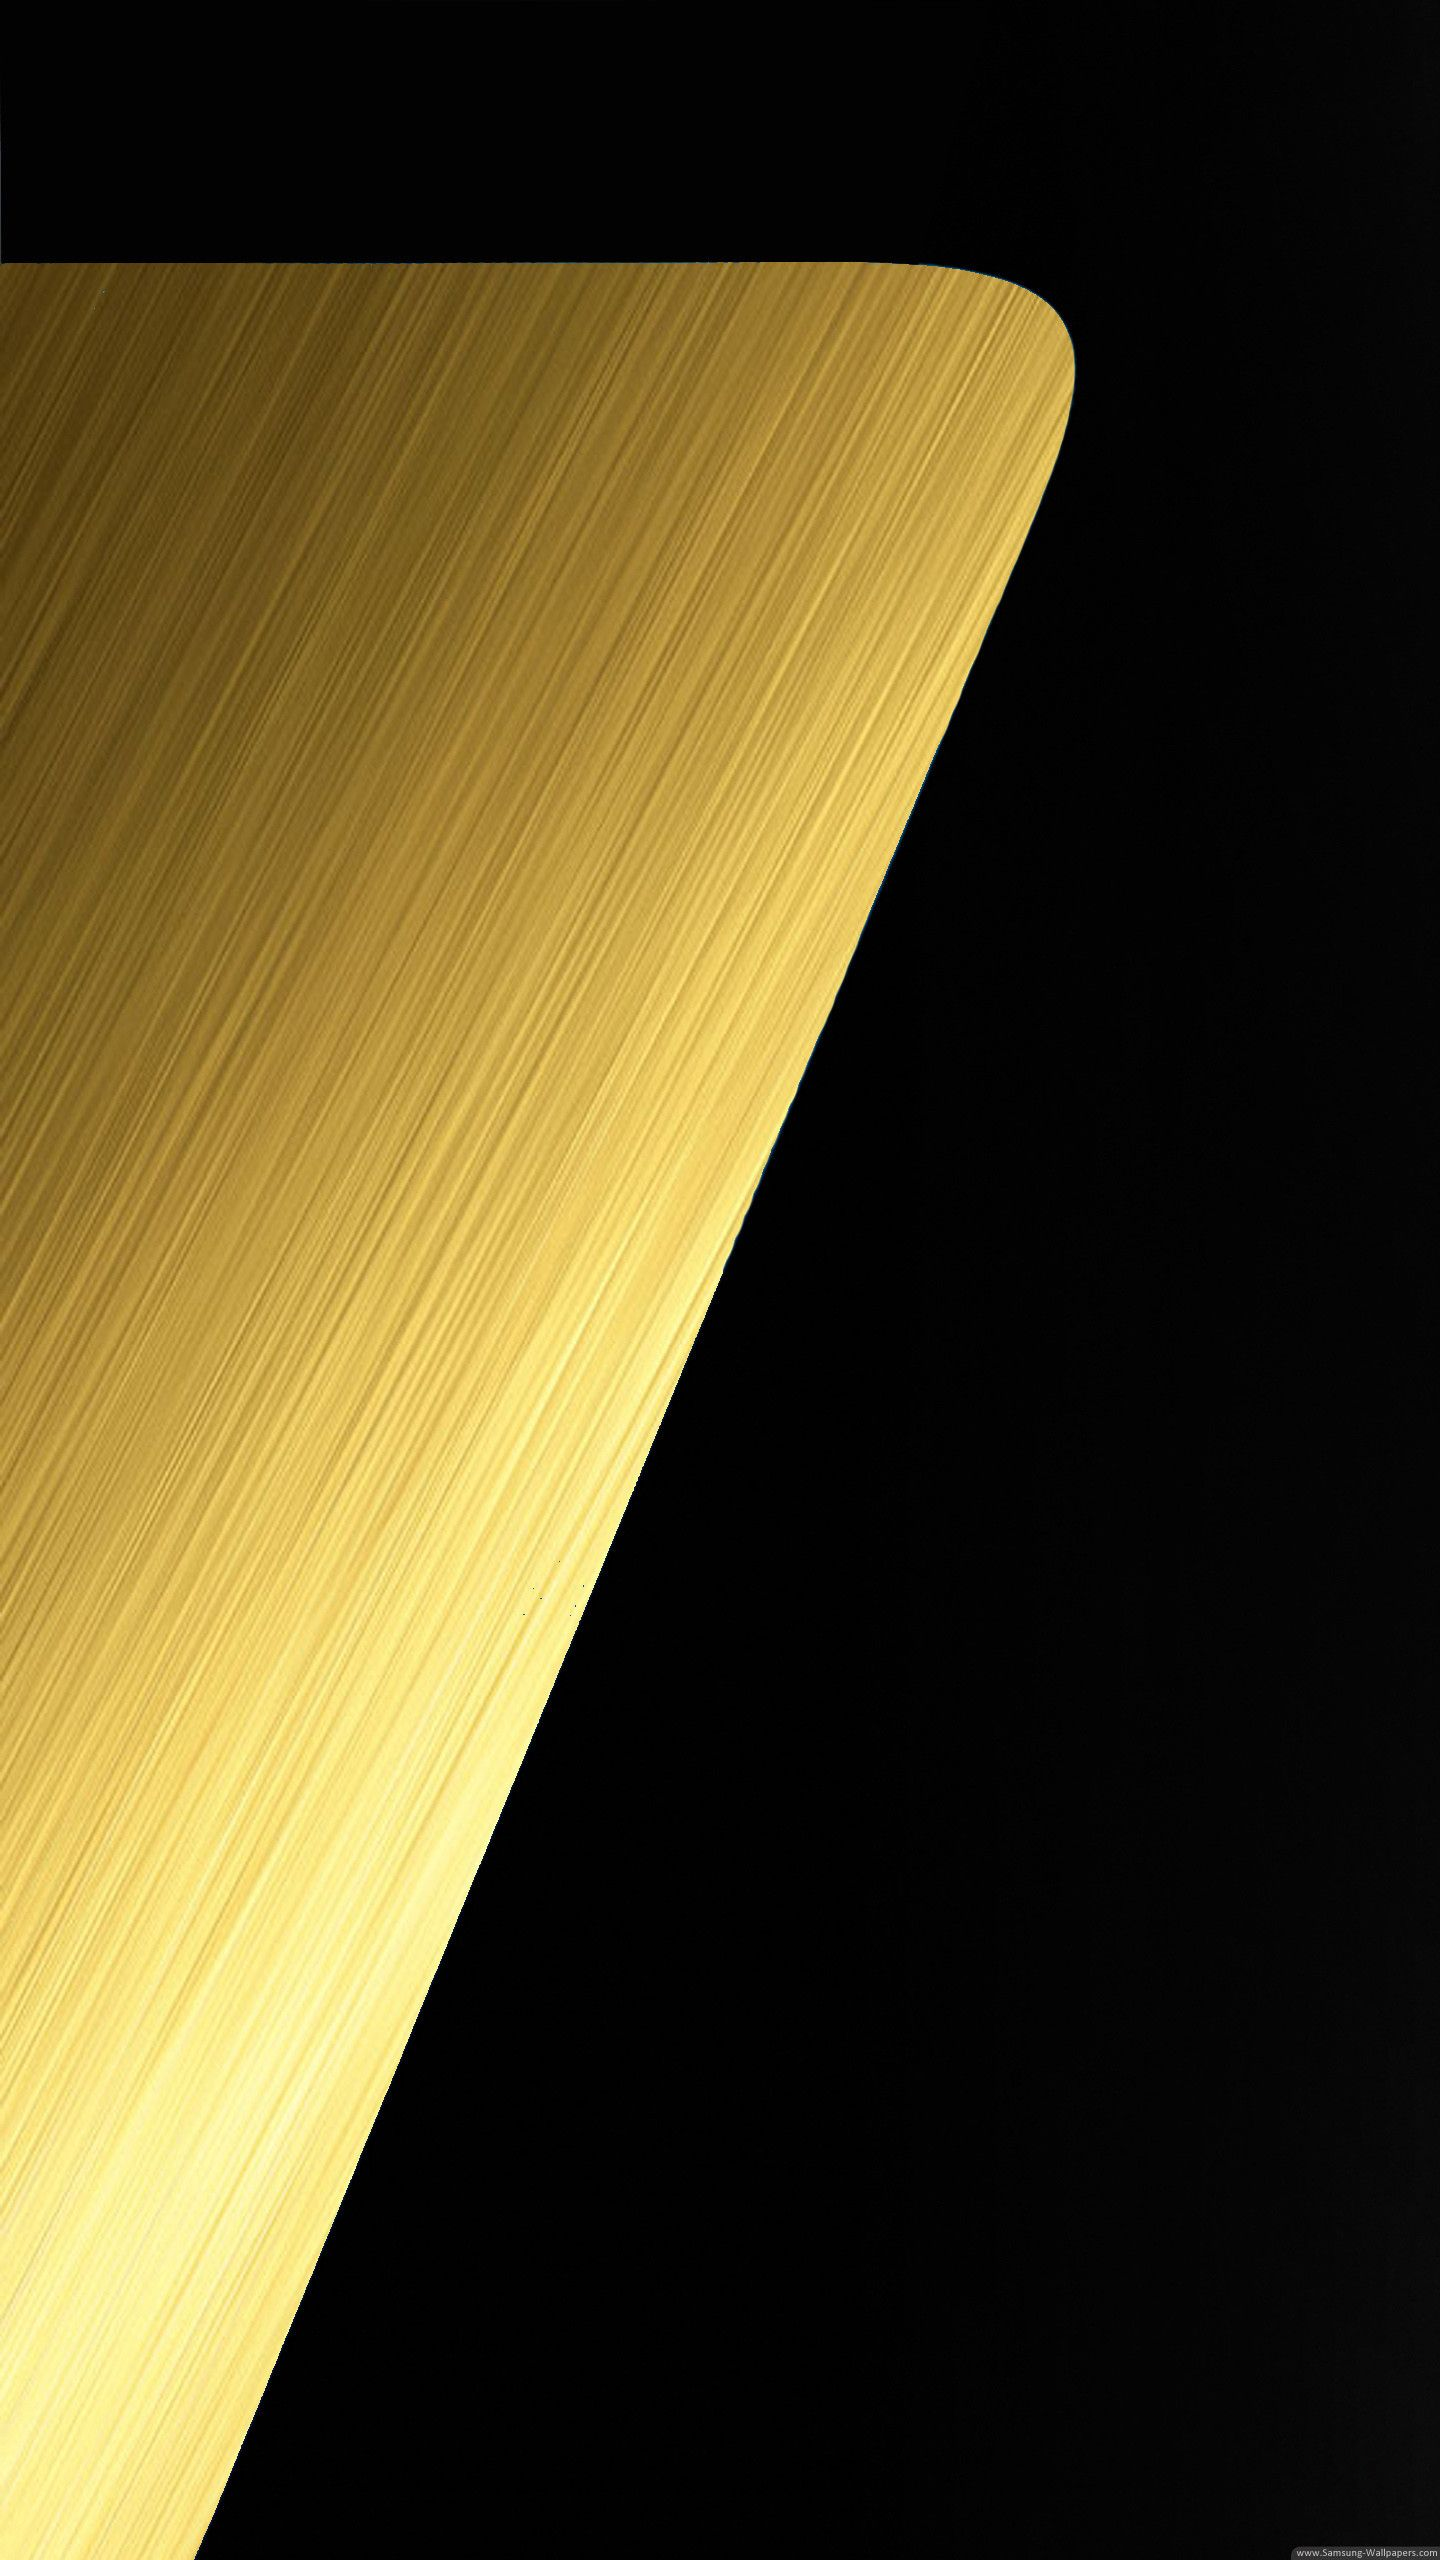 Gold Samsung Galaxy S7 Edge Wallpaper